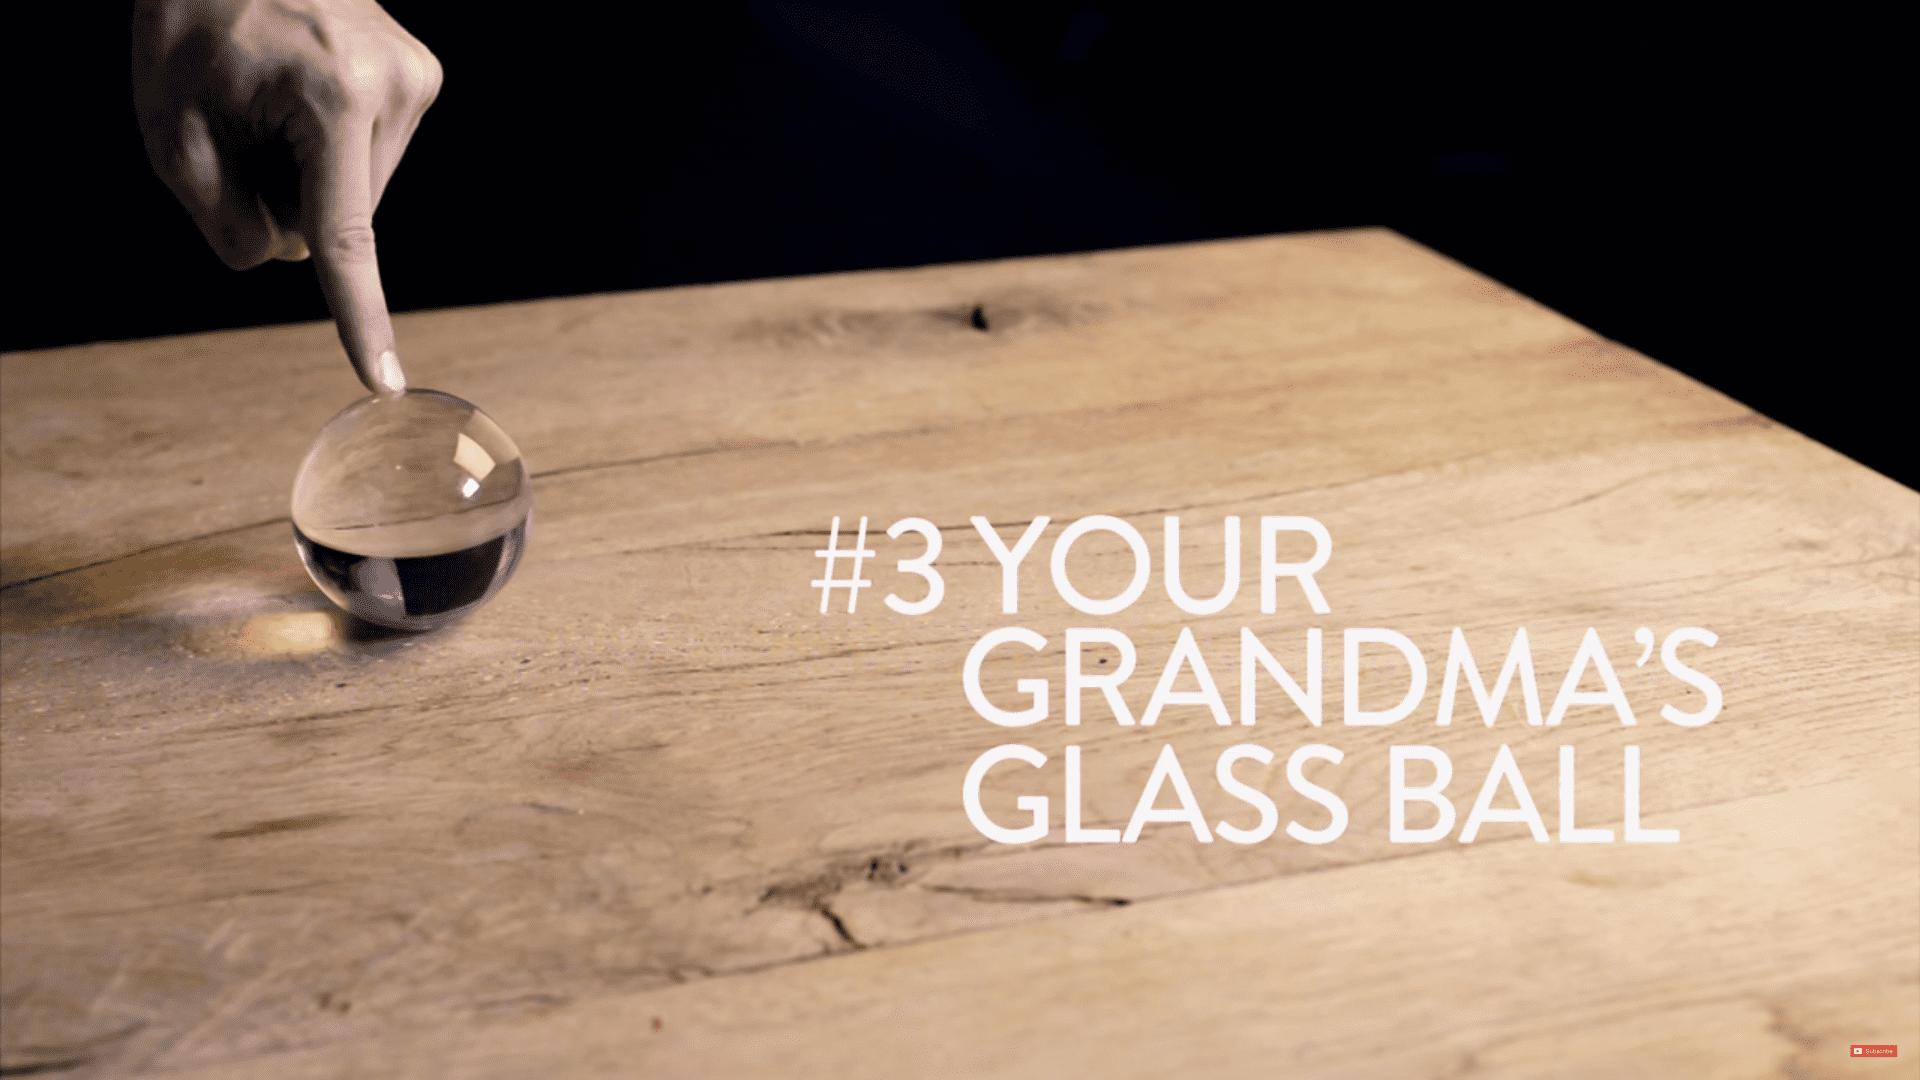 glassball1 min image